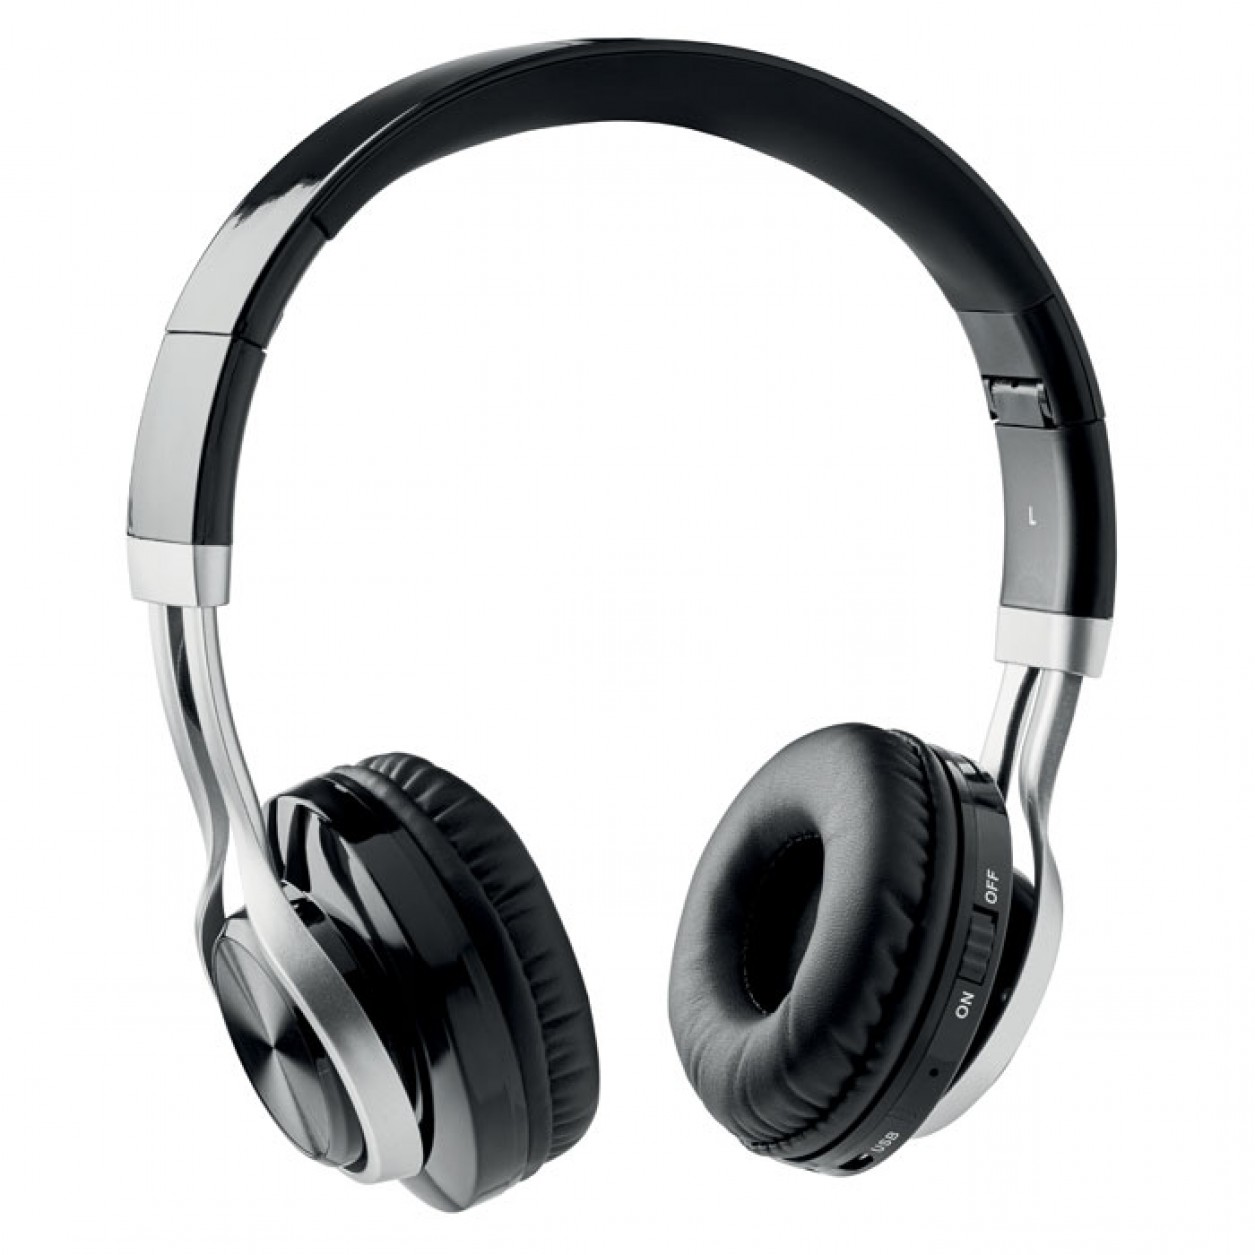 Jacob Bluetooth Headphone